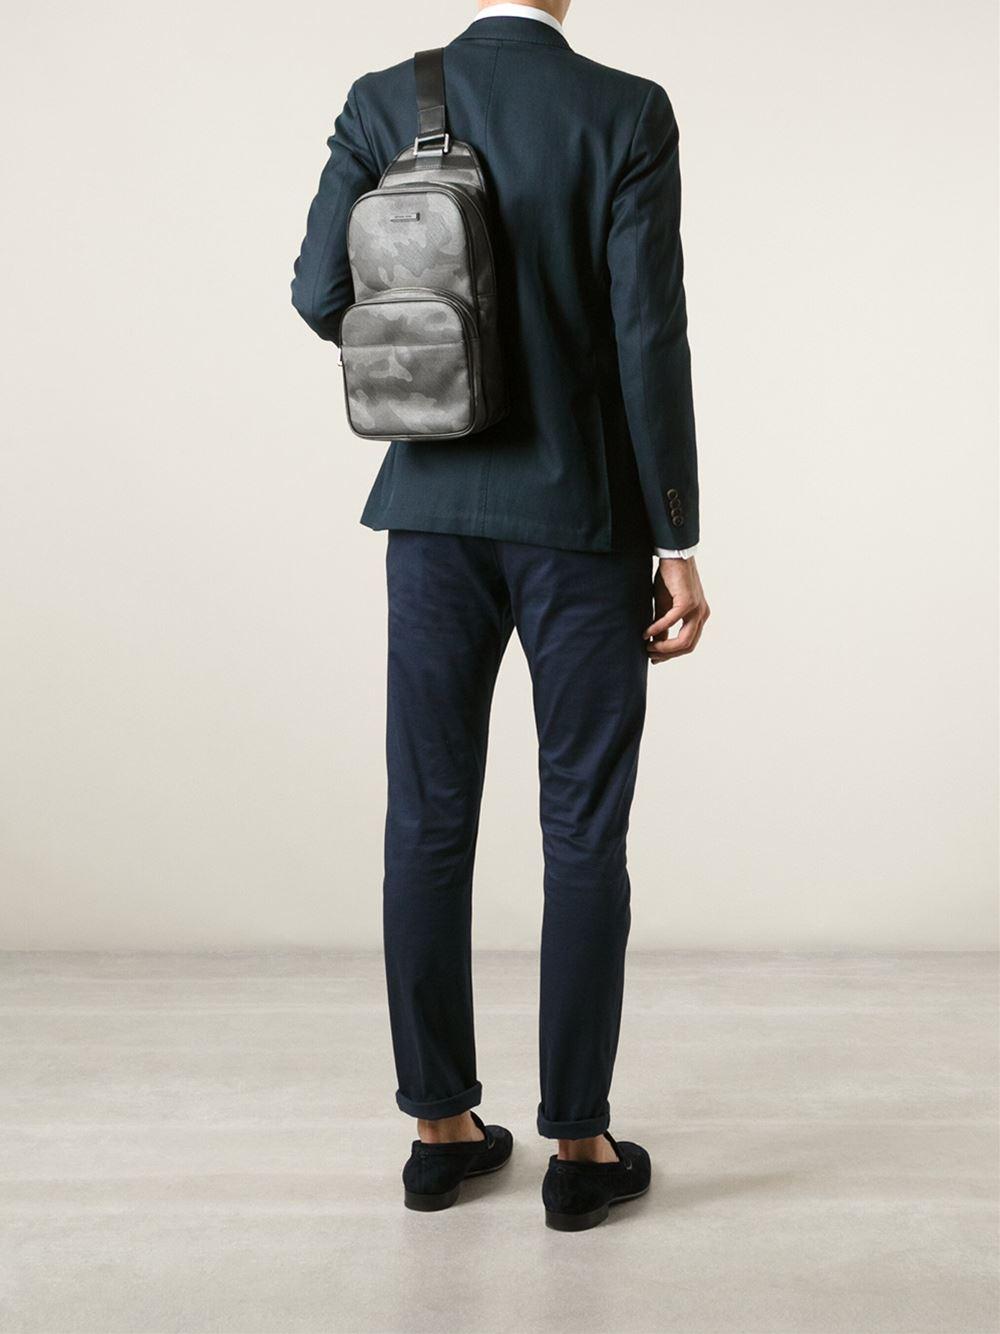 Michael Kors Backpack For Men - BackpackStyle